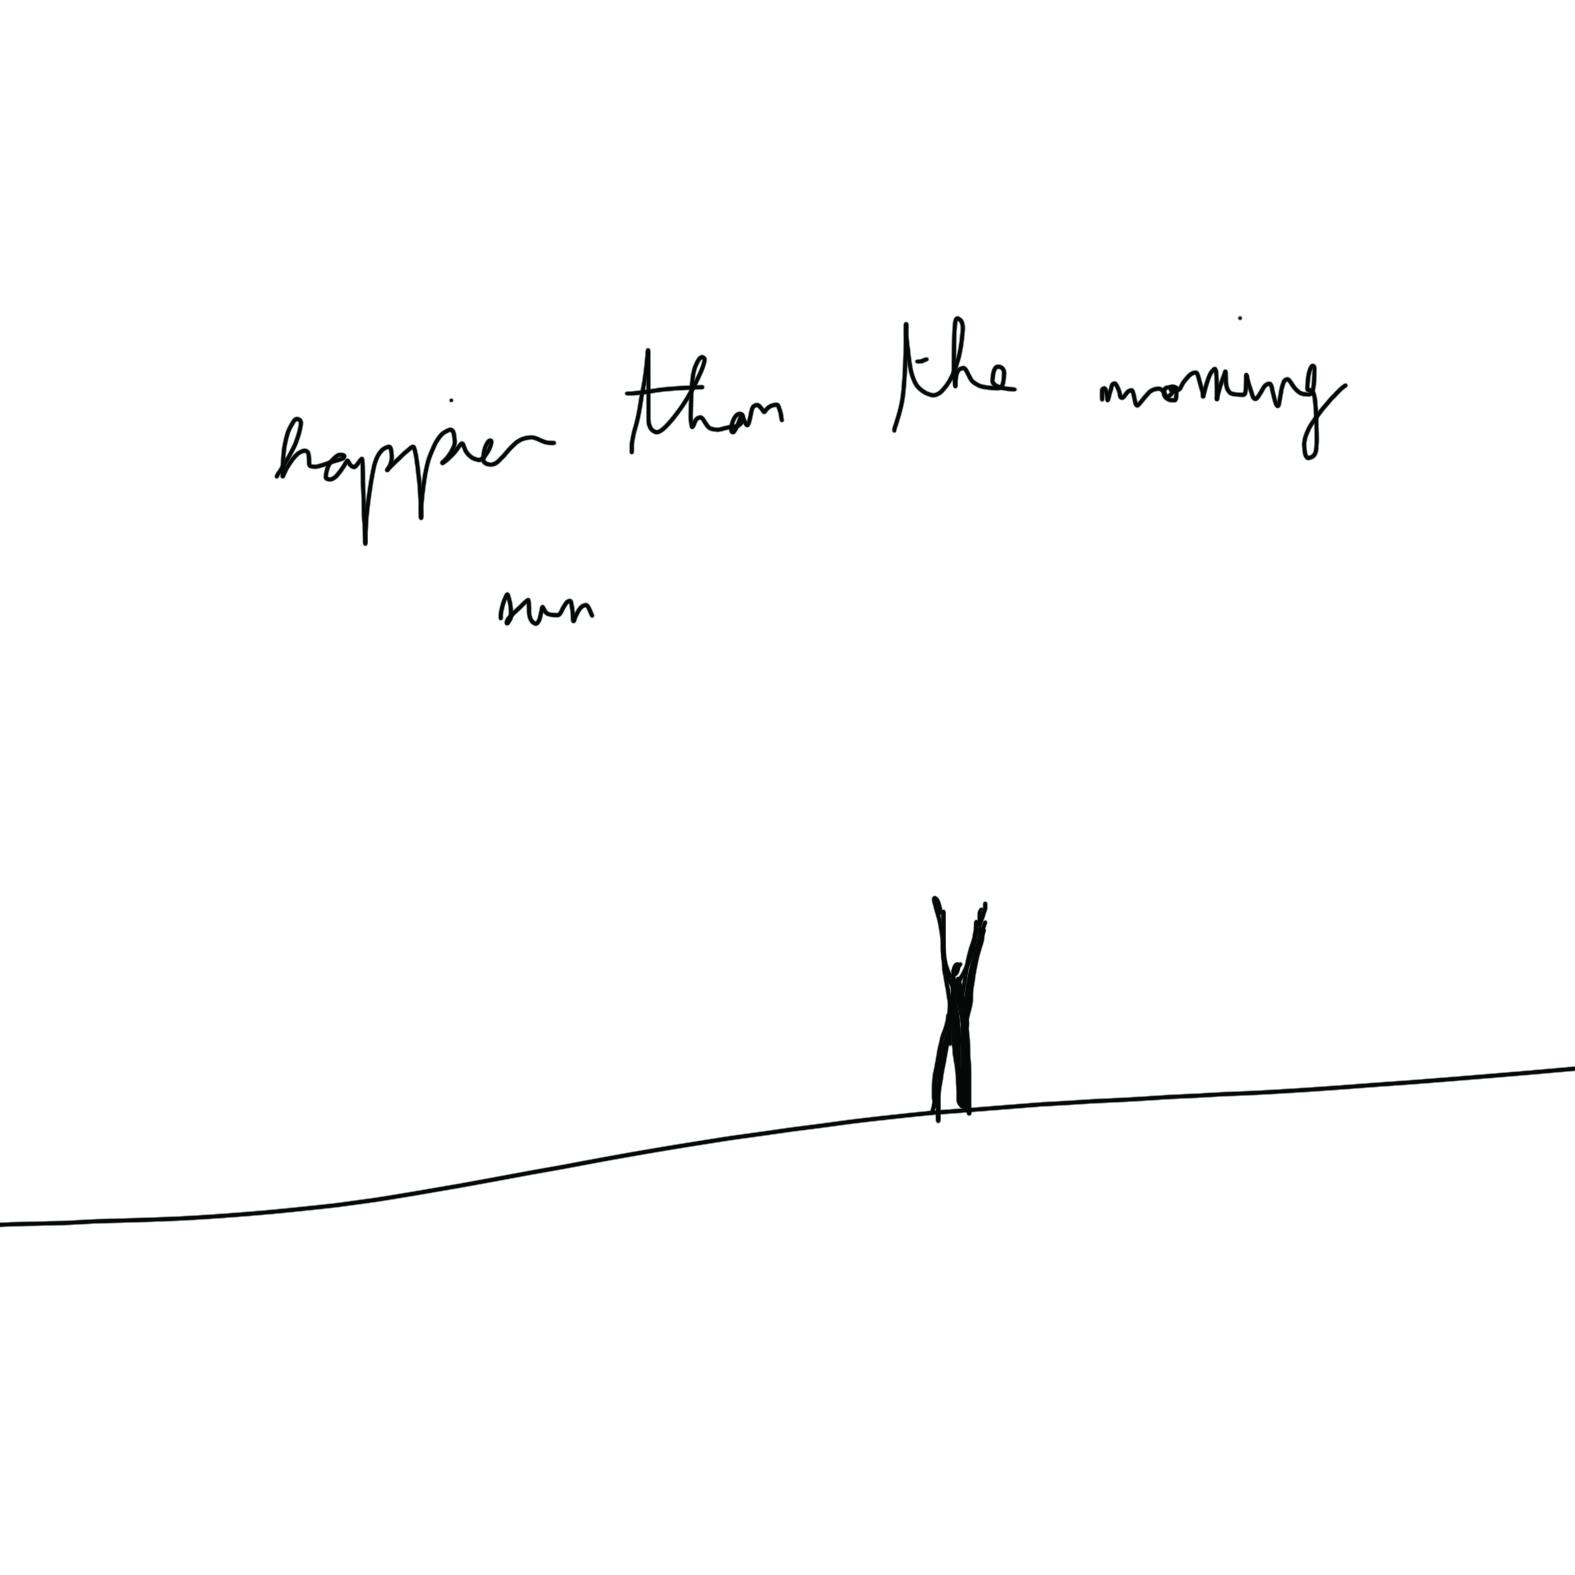 happier than